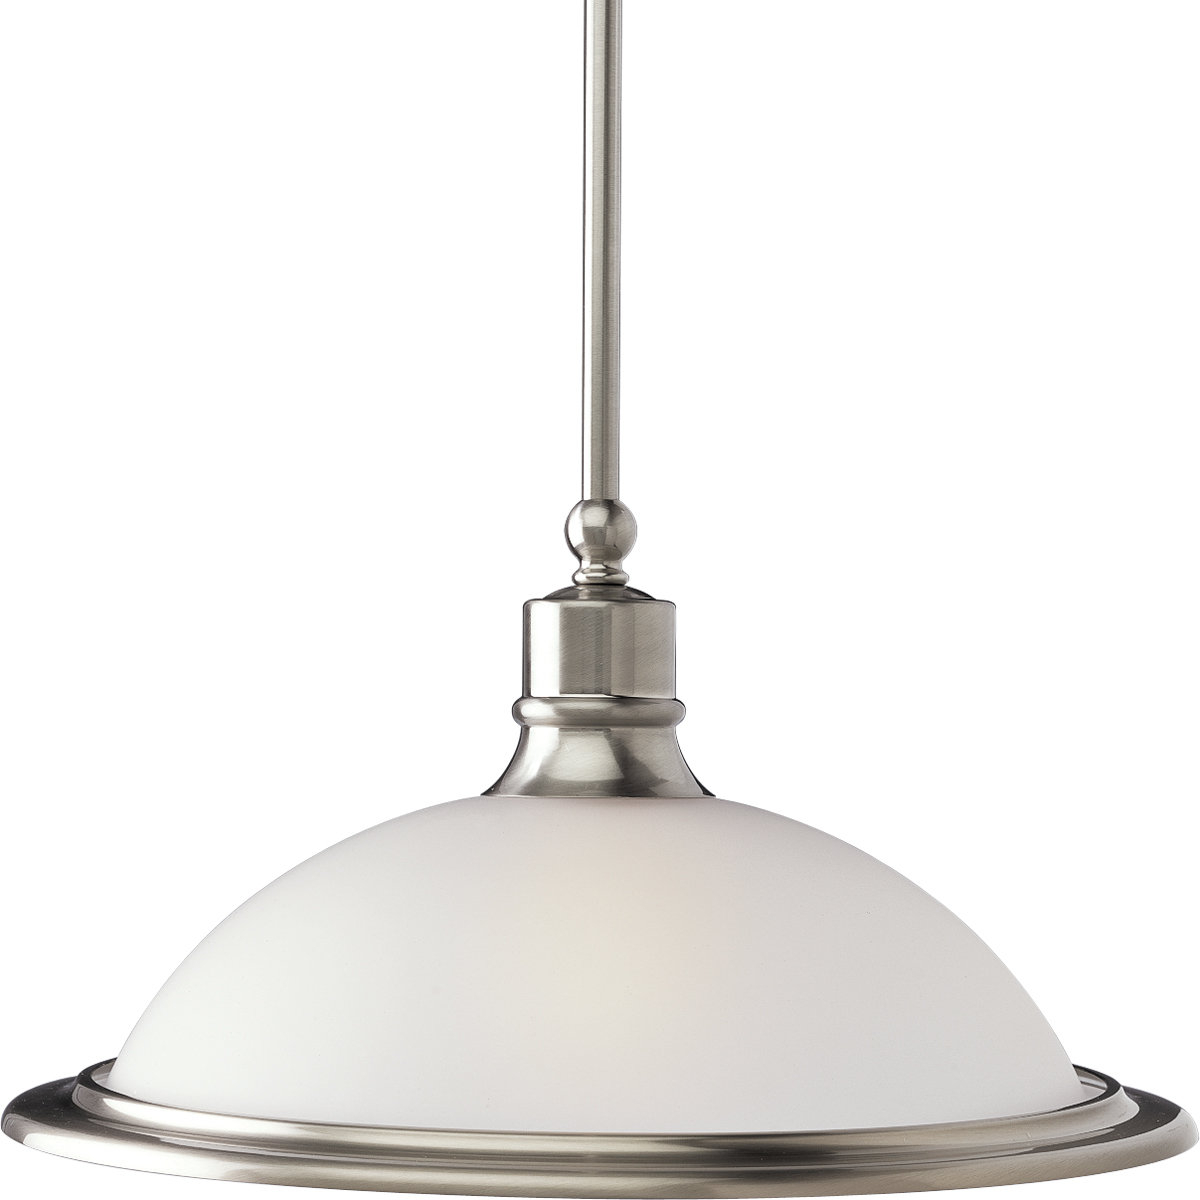 Latest Abernathy 1 Light Dome Pendants Within Vangorder 1 Light Dome Pendant (View 9 of 20)